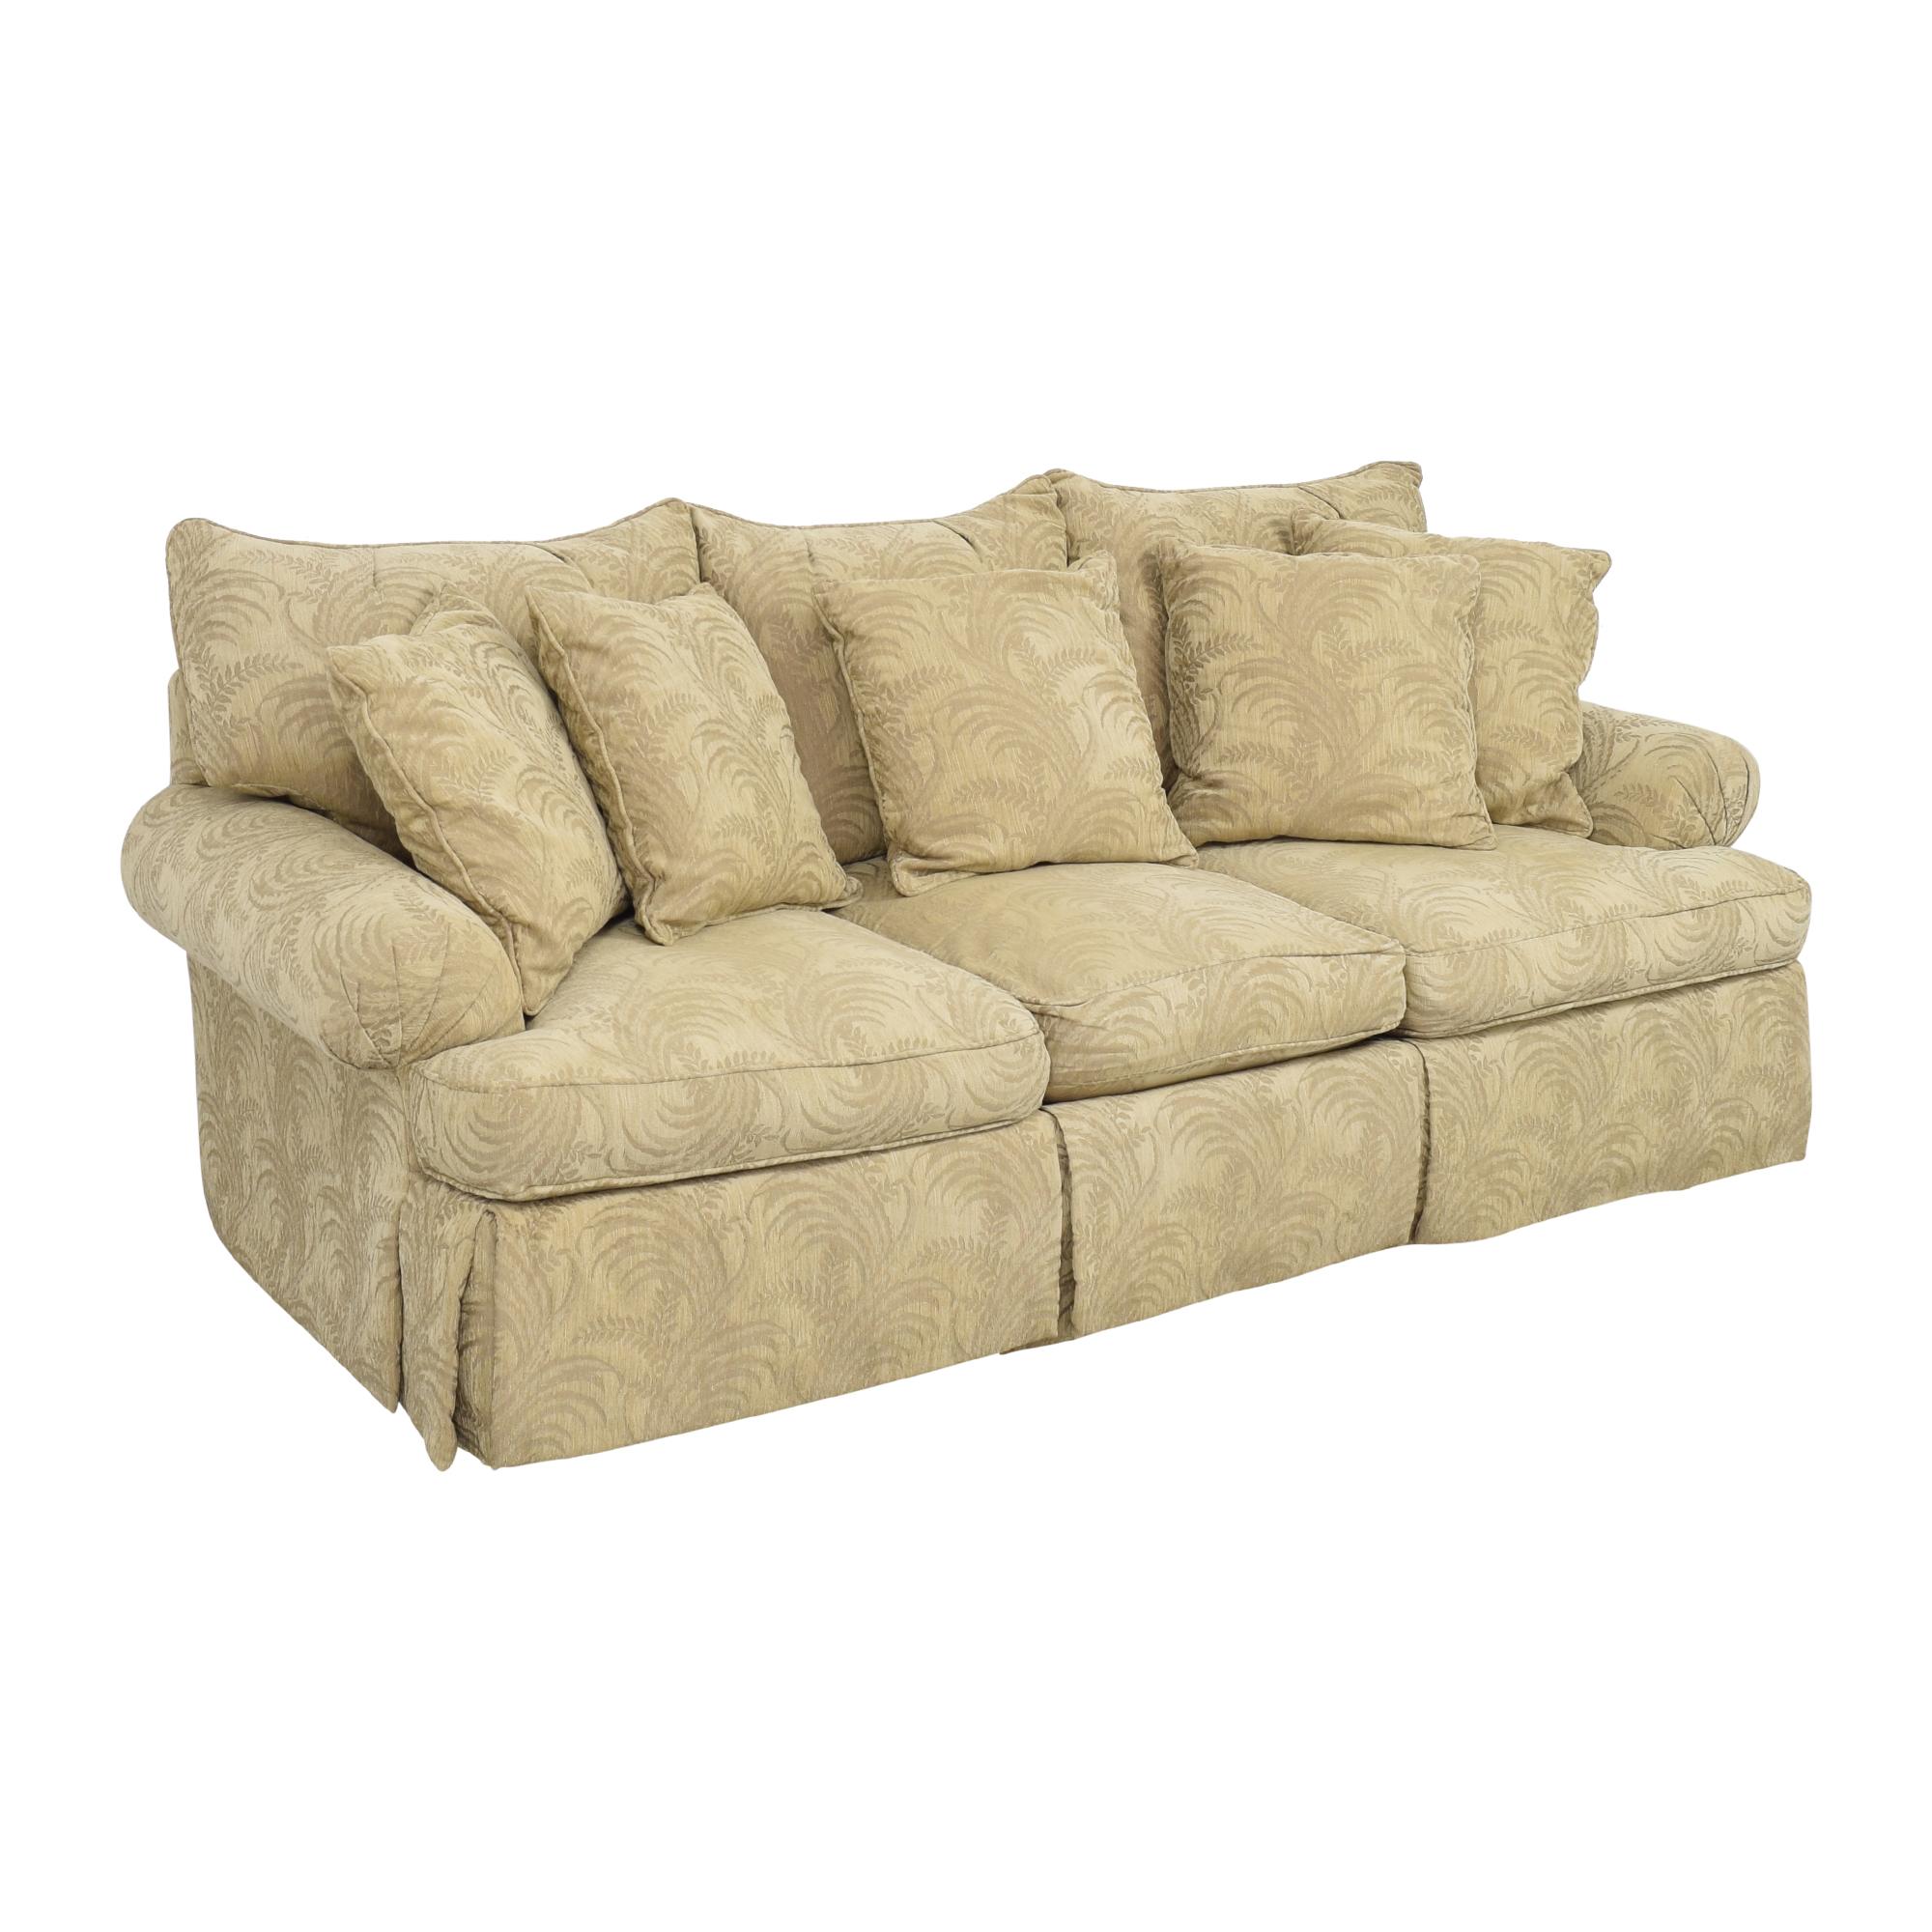 Bernhardt Bernhardt Roll Arm Three Cushion Sofa nj